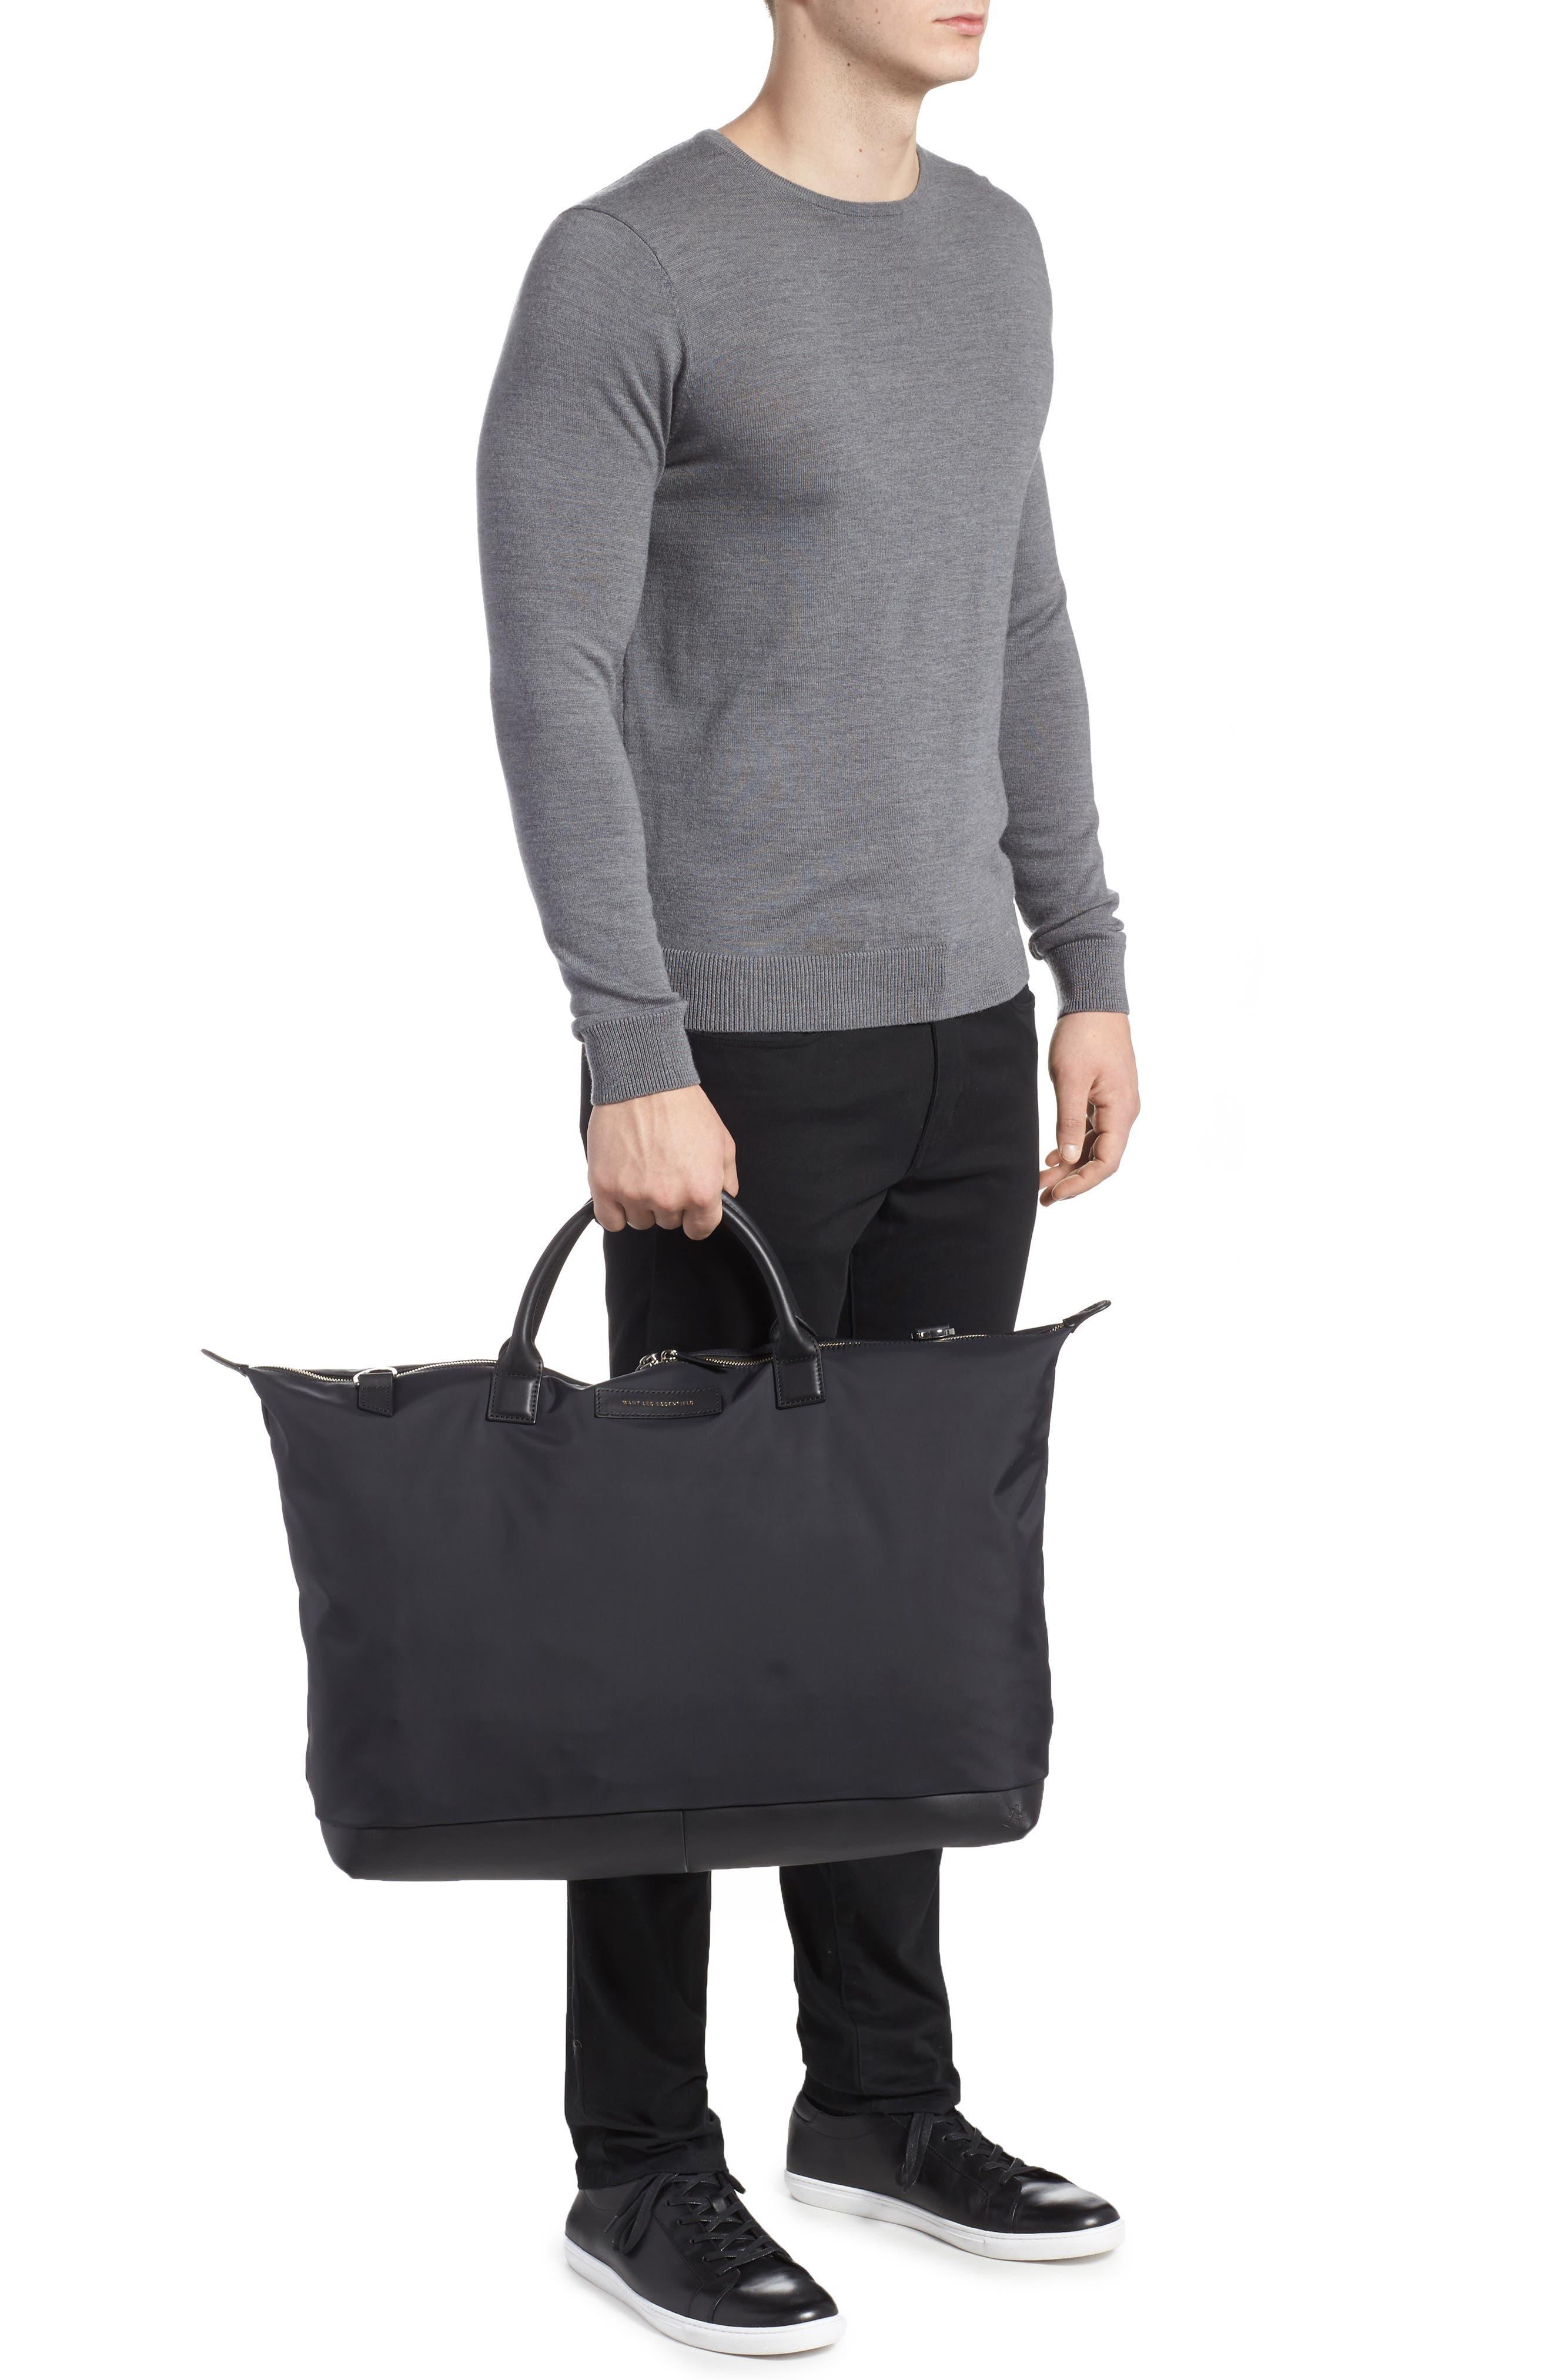 Hartsfield Nylon Tote Bag,                             Alternate thumbnail 2, color,                             Black Nylon